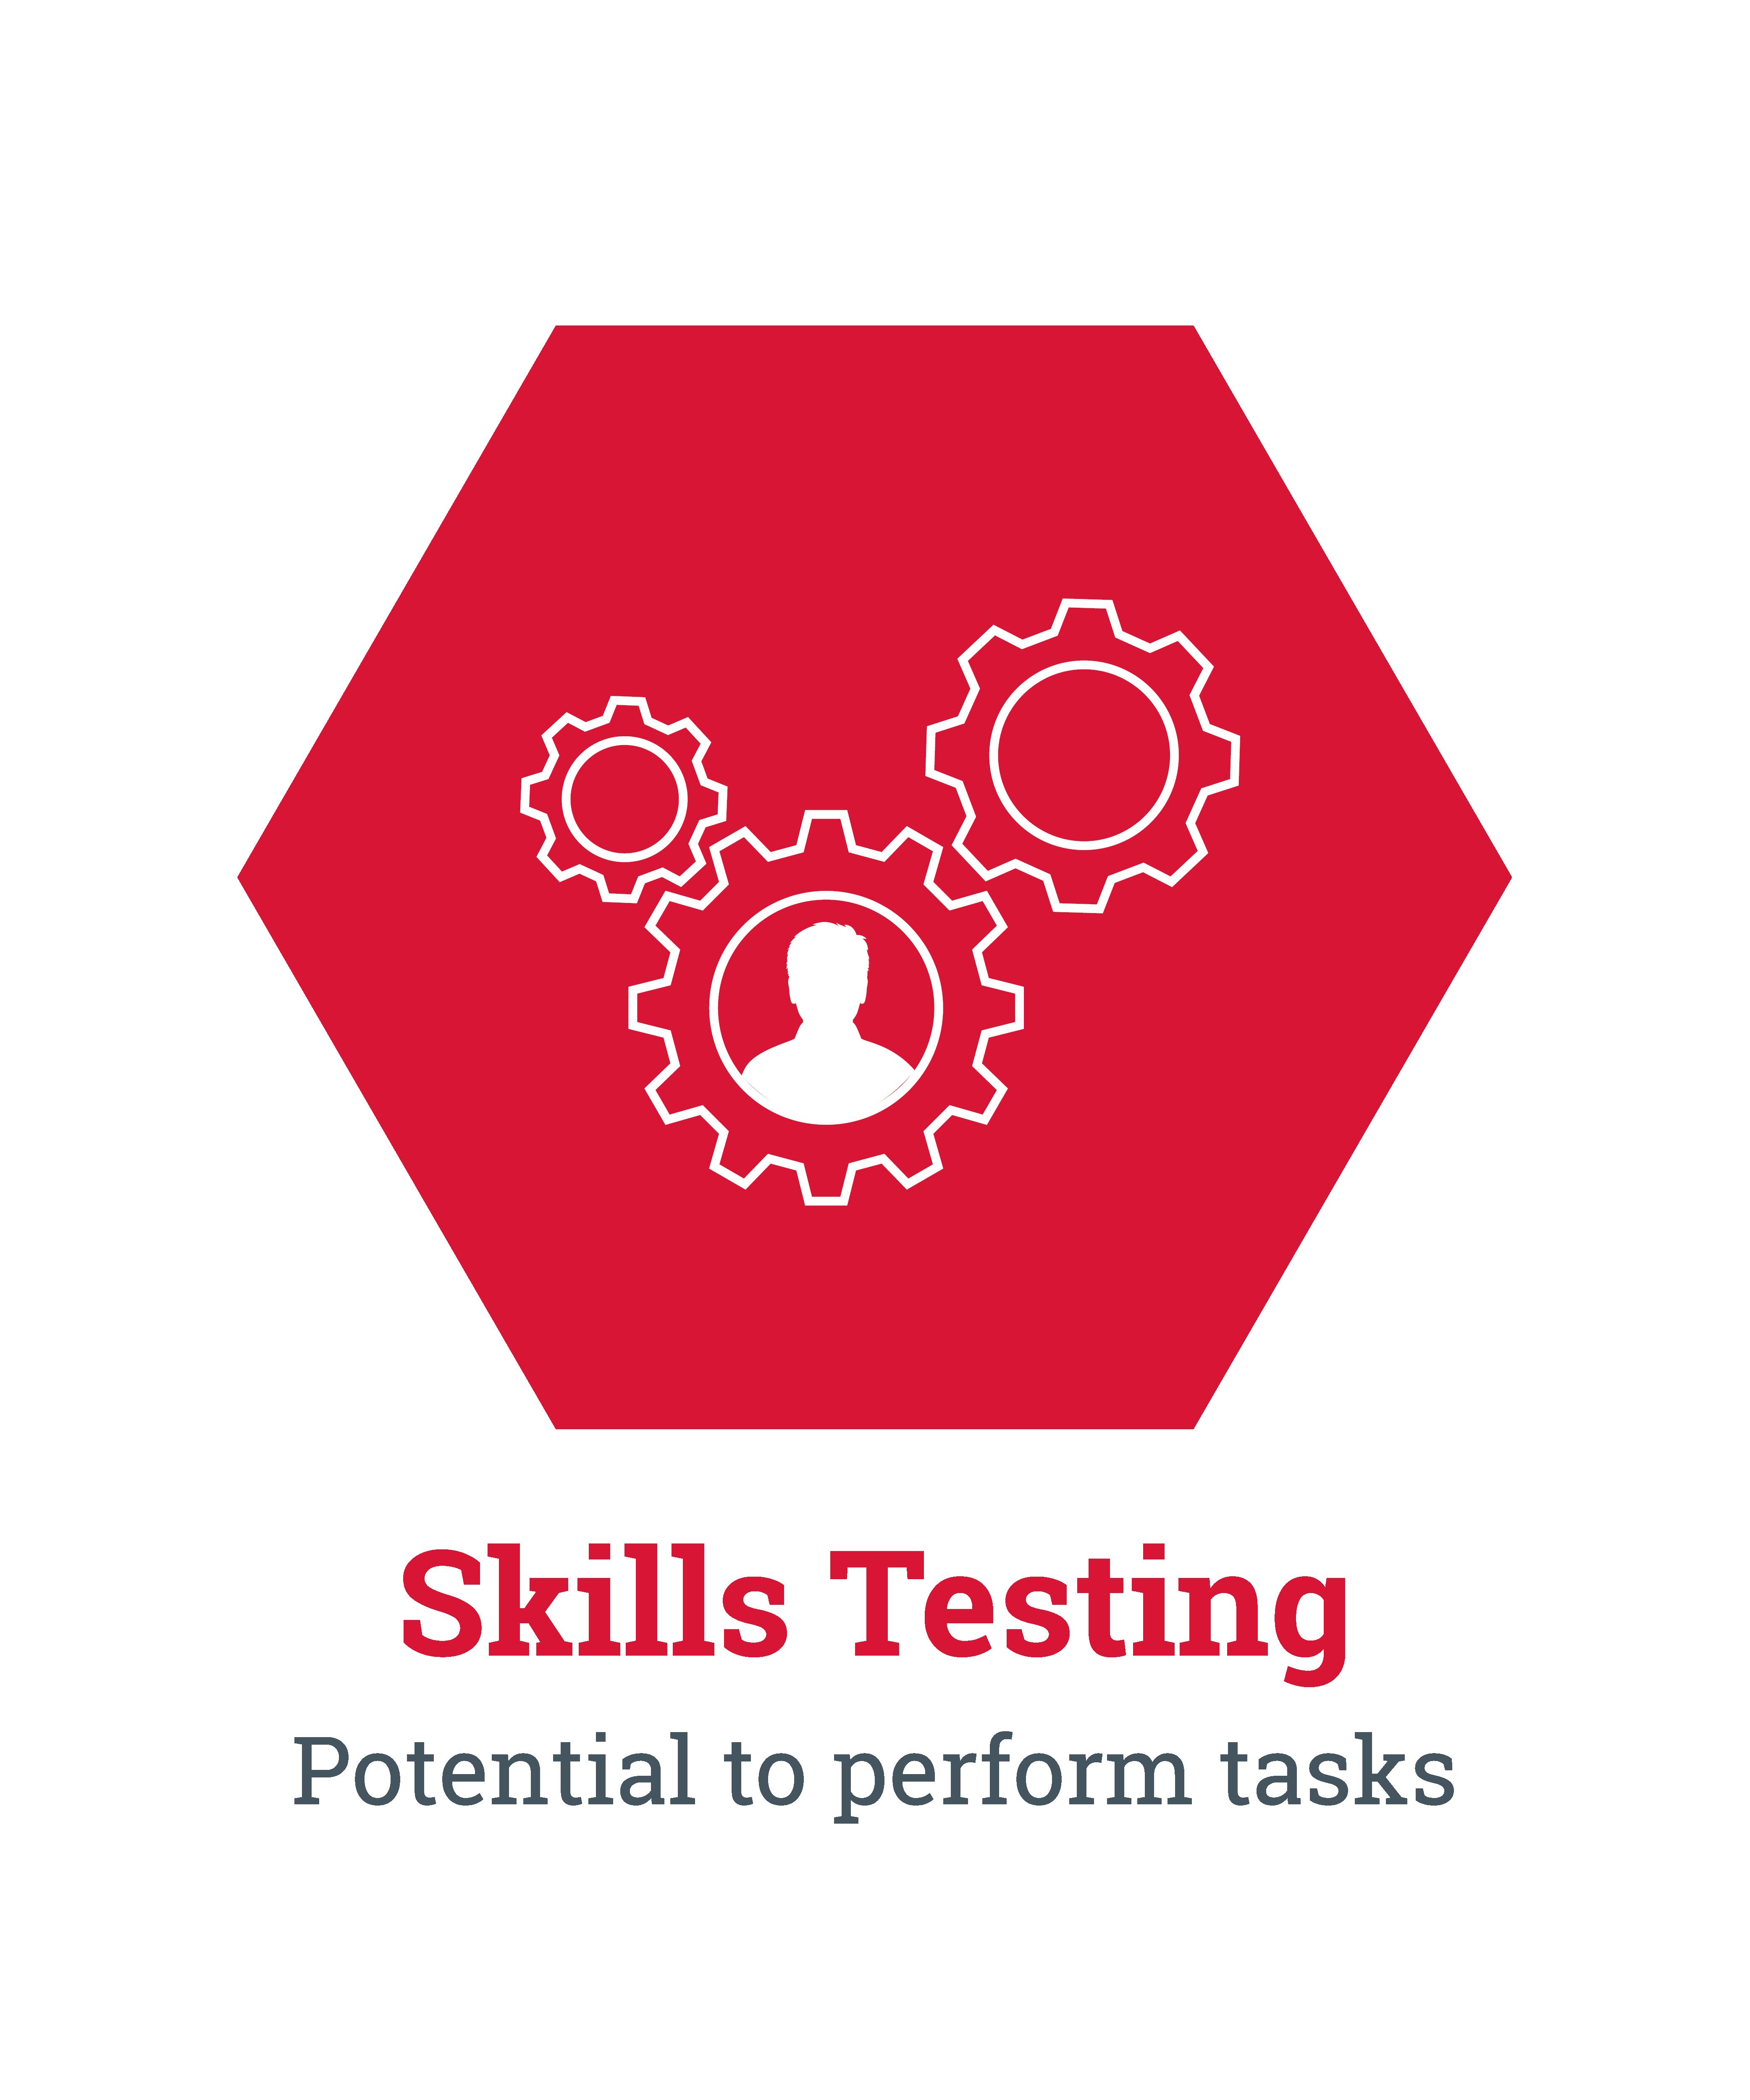 Skills Testing. Potential to perform tasks